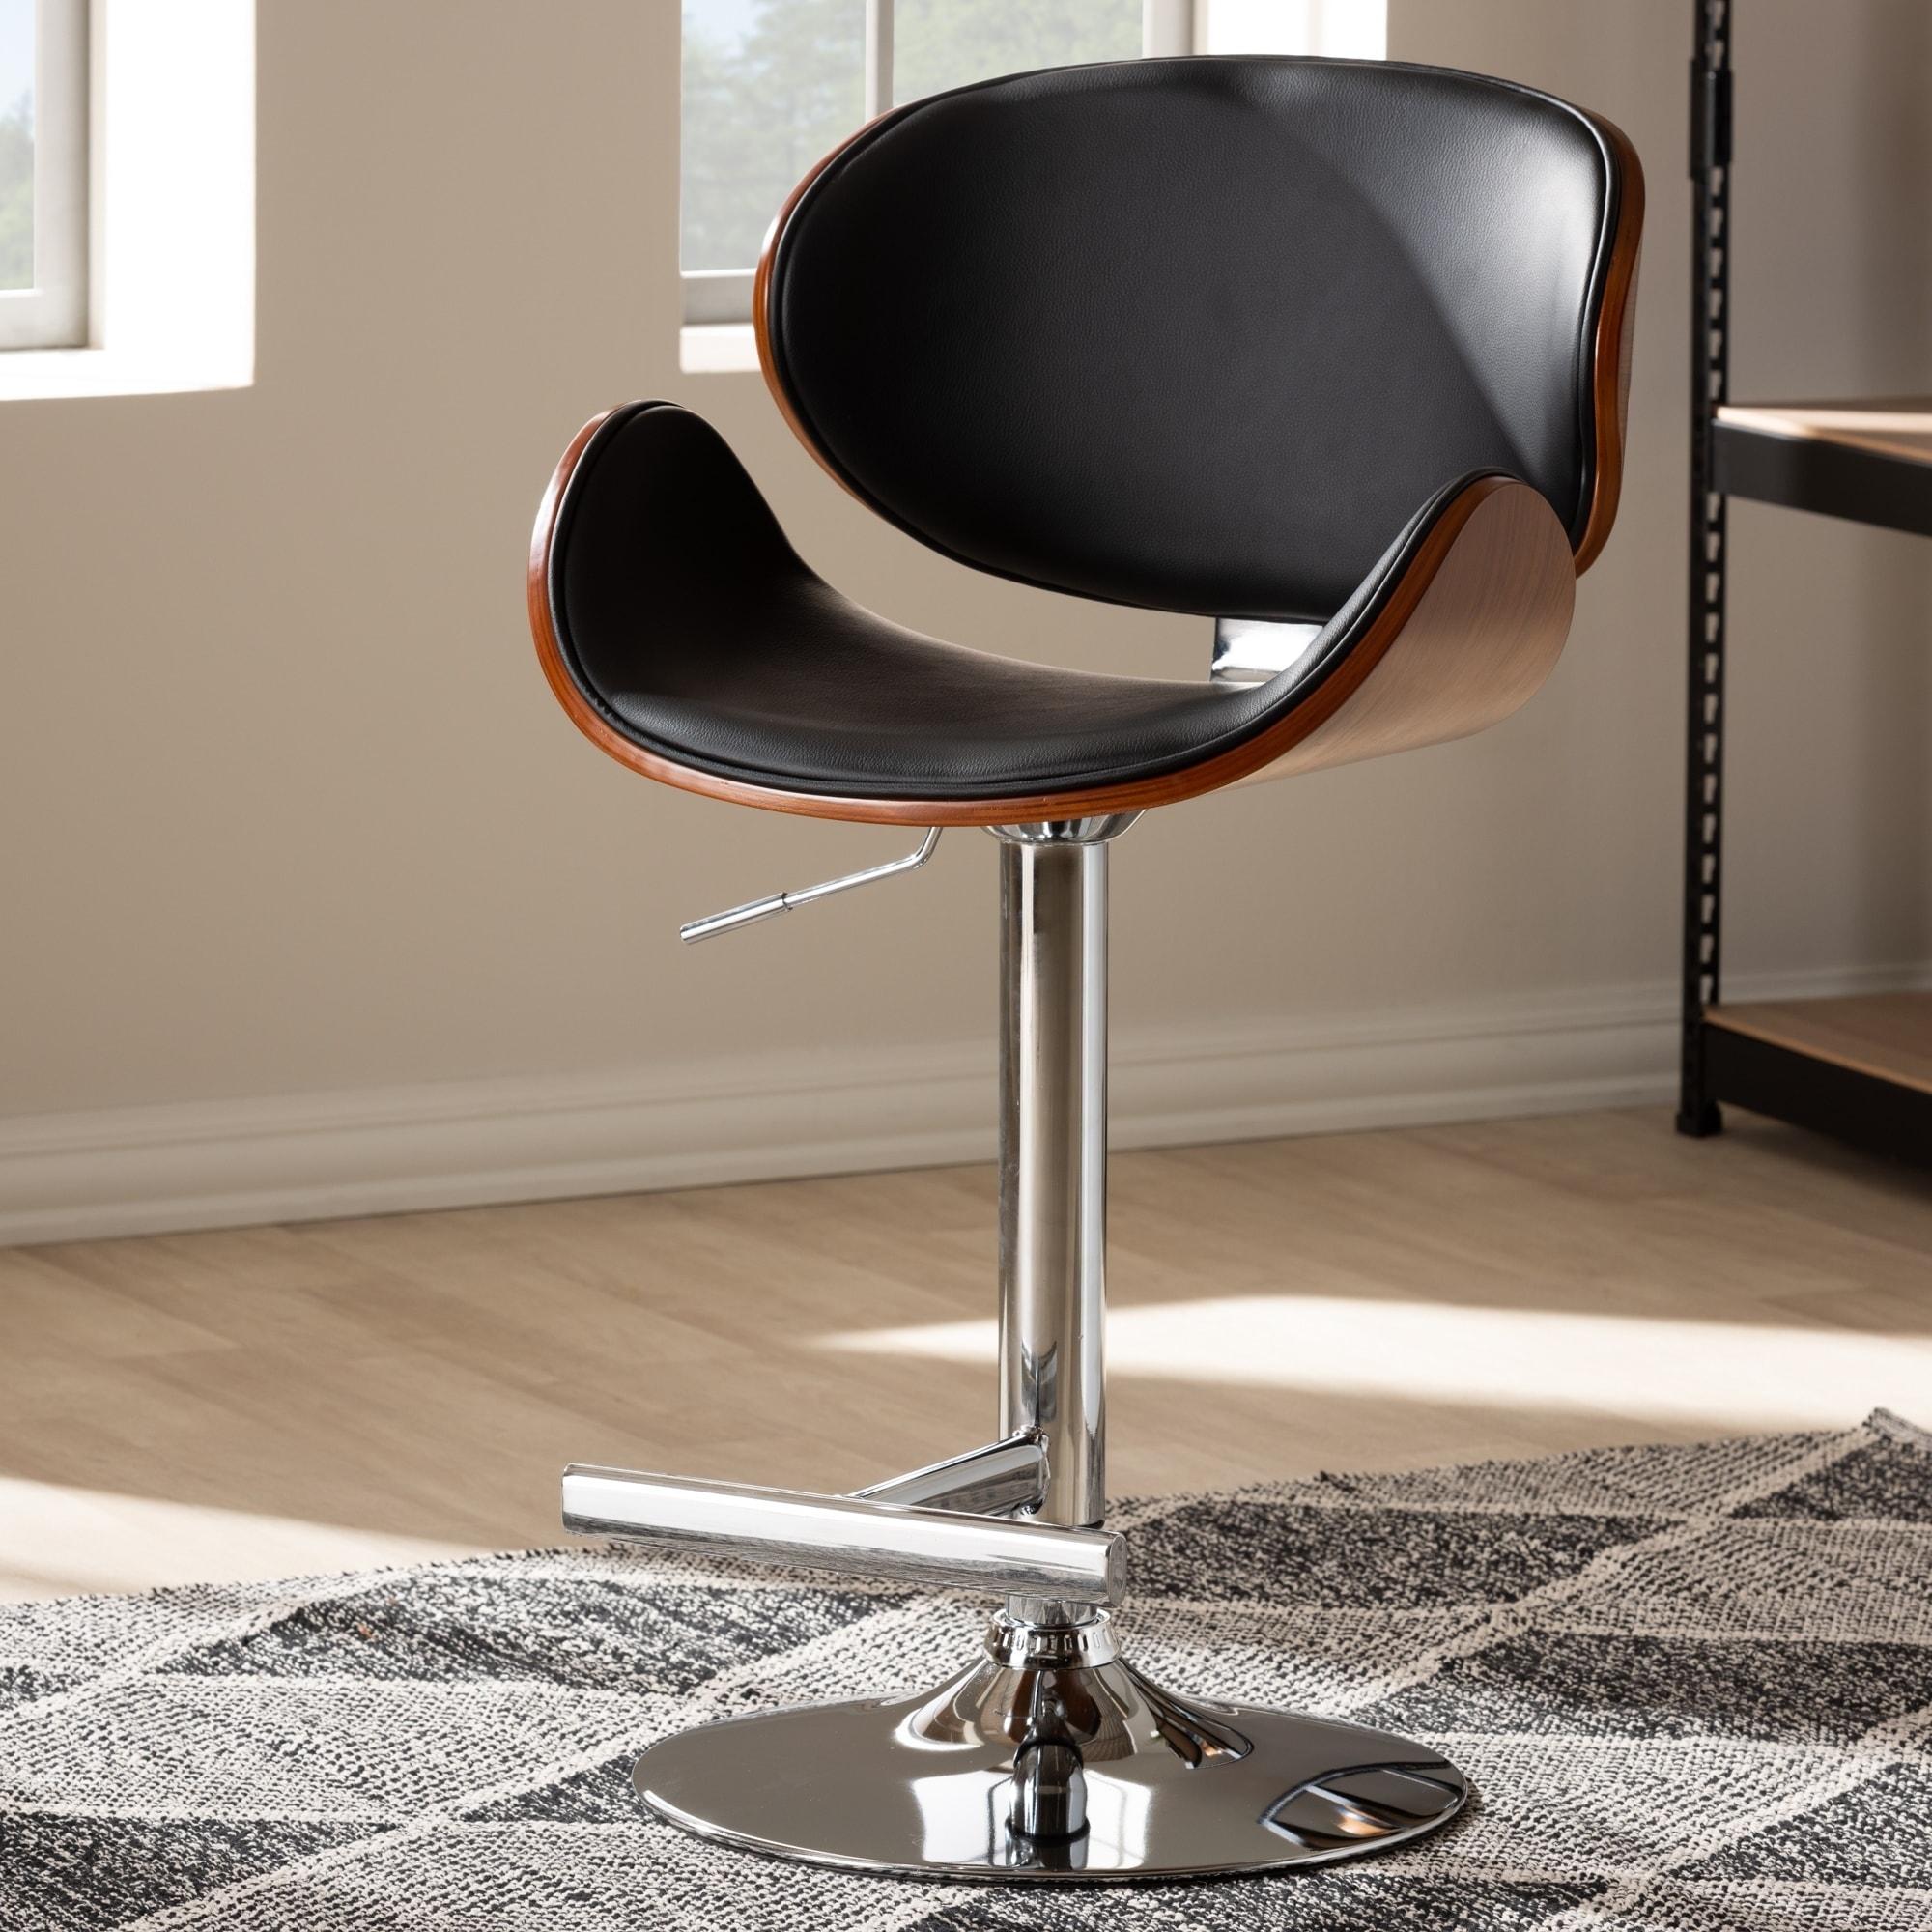 Brilliant Contemporary Black Adjustable Swivel Bar Stool By Baxton Studio Lamtechconsult Wood Chair Design Ideas Lamtechconsultcom